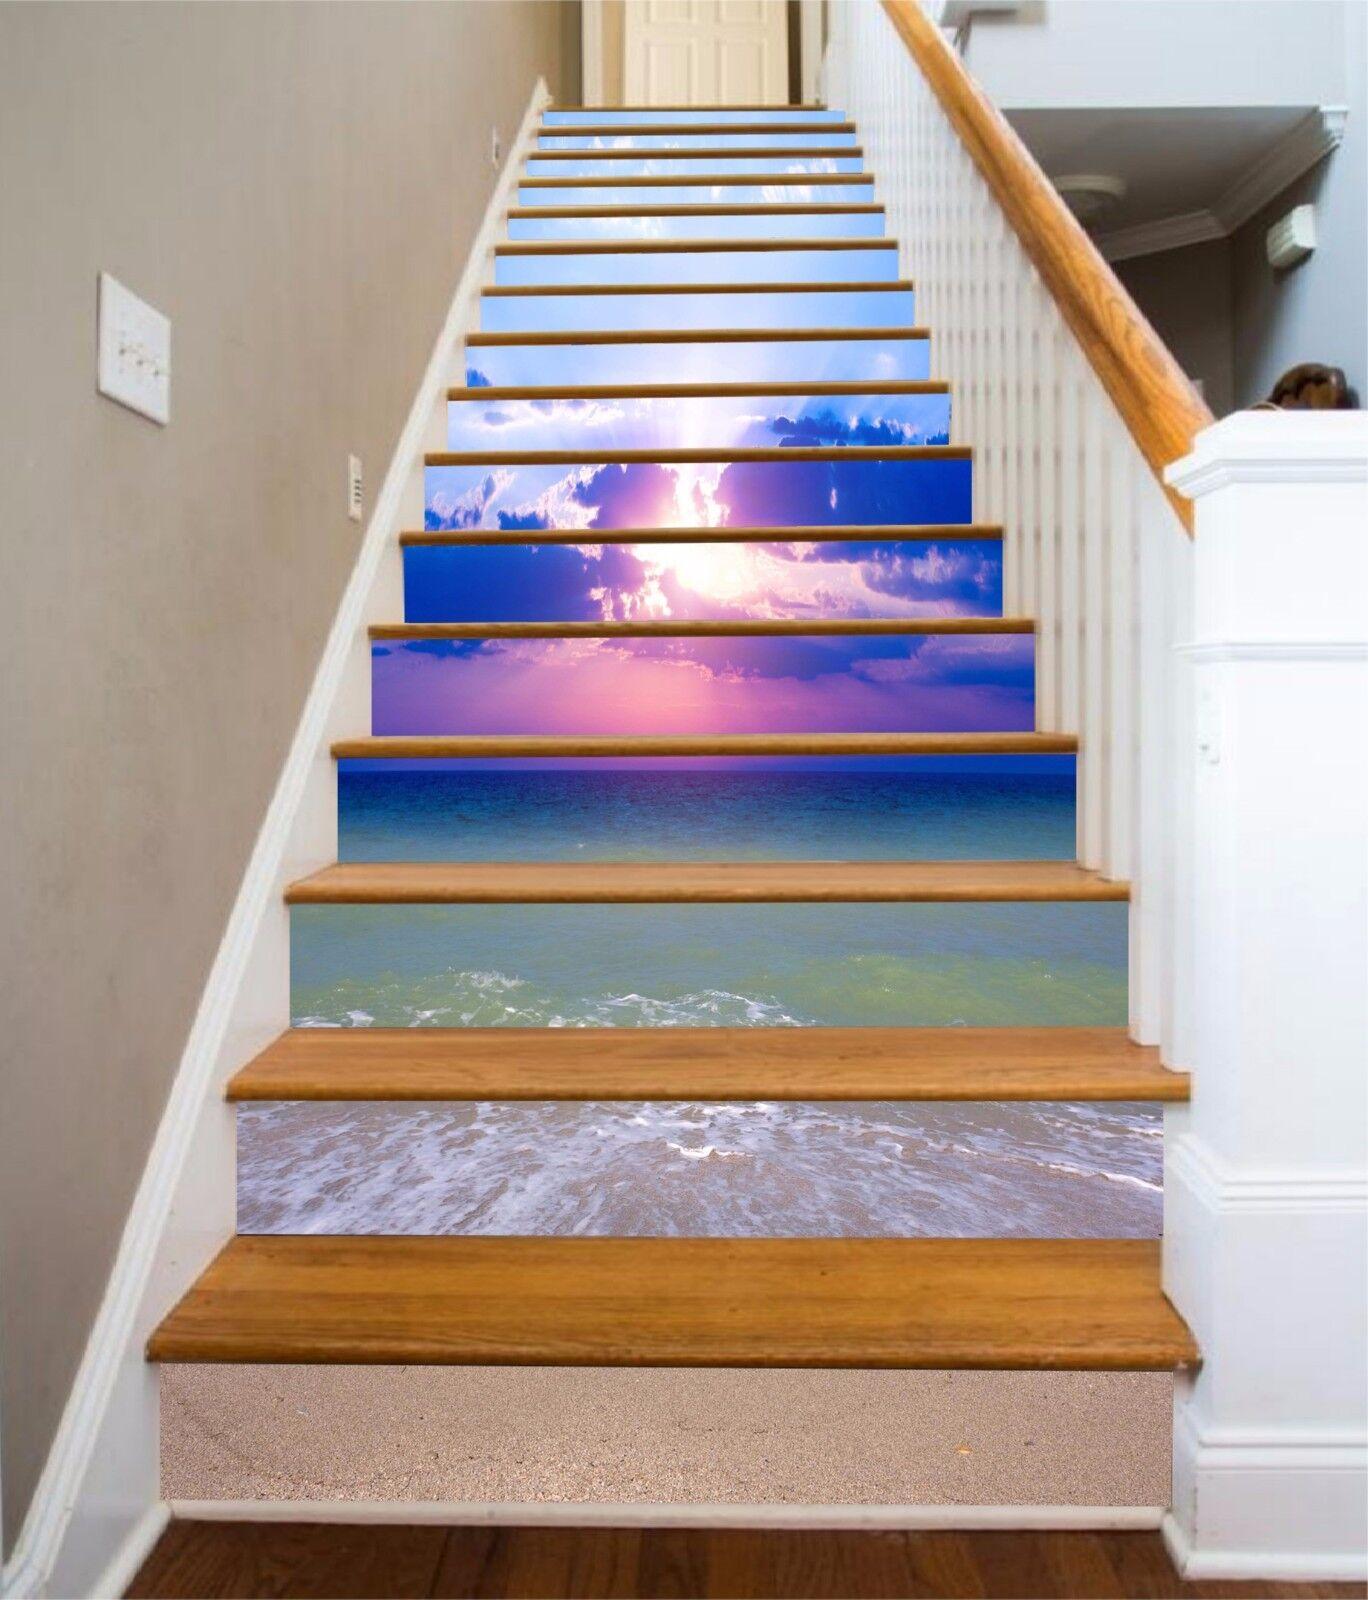 3D Sky beach sea 7 Stair Risers Decoration Photo Mural Vinyl Decal Wallpaper UK